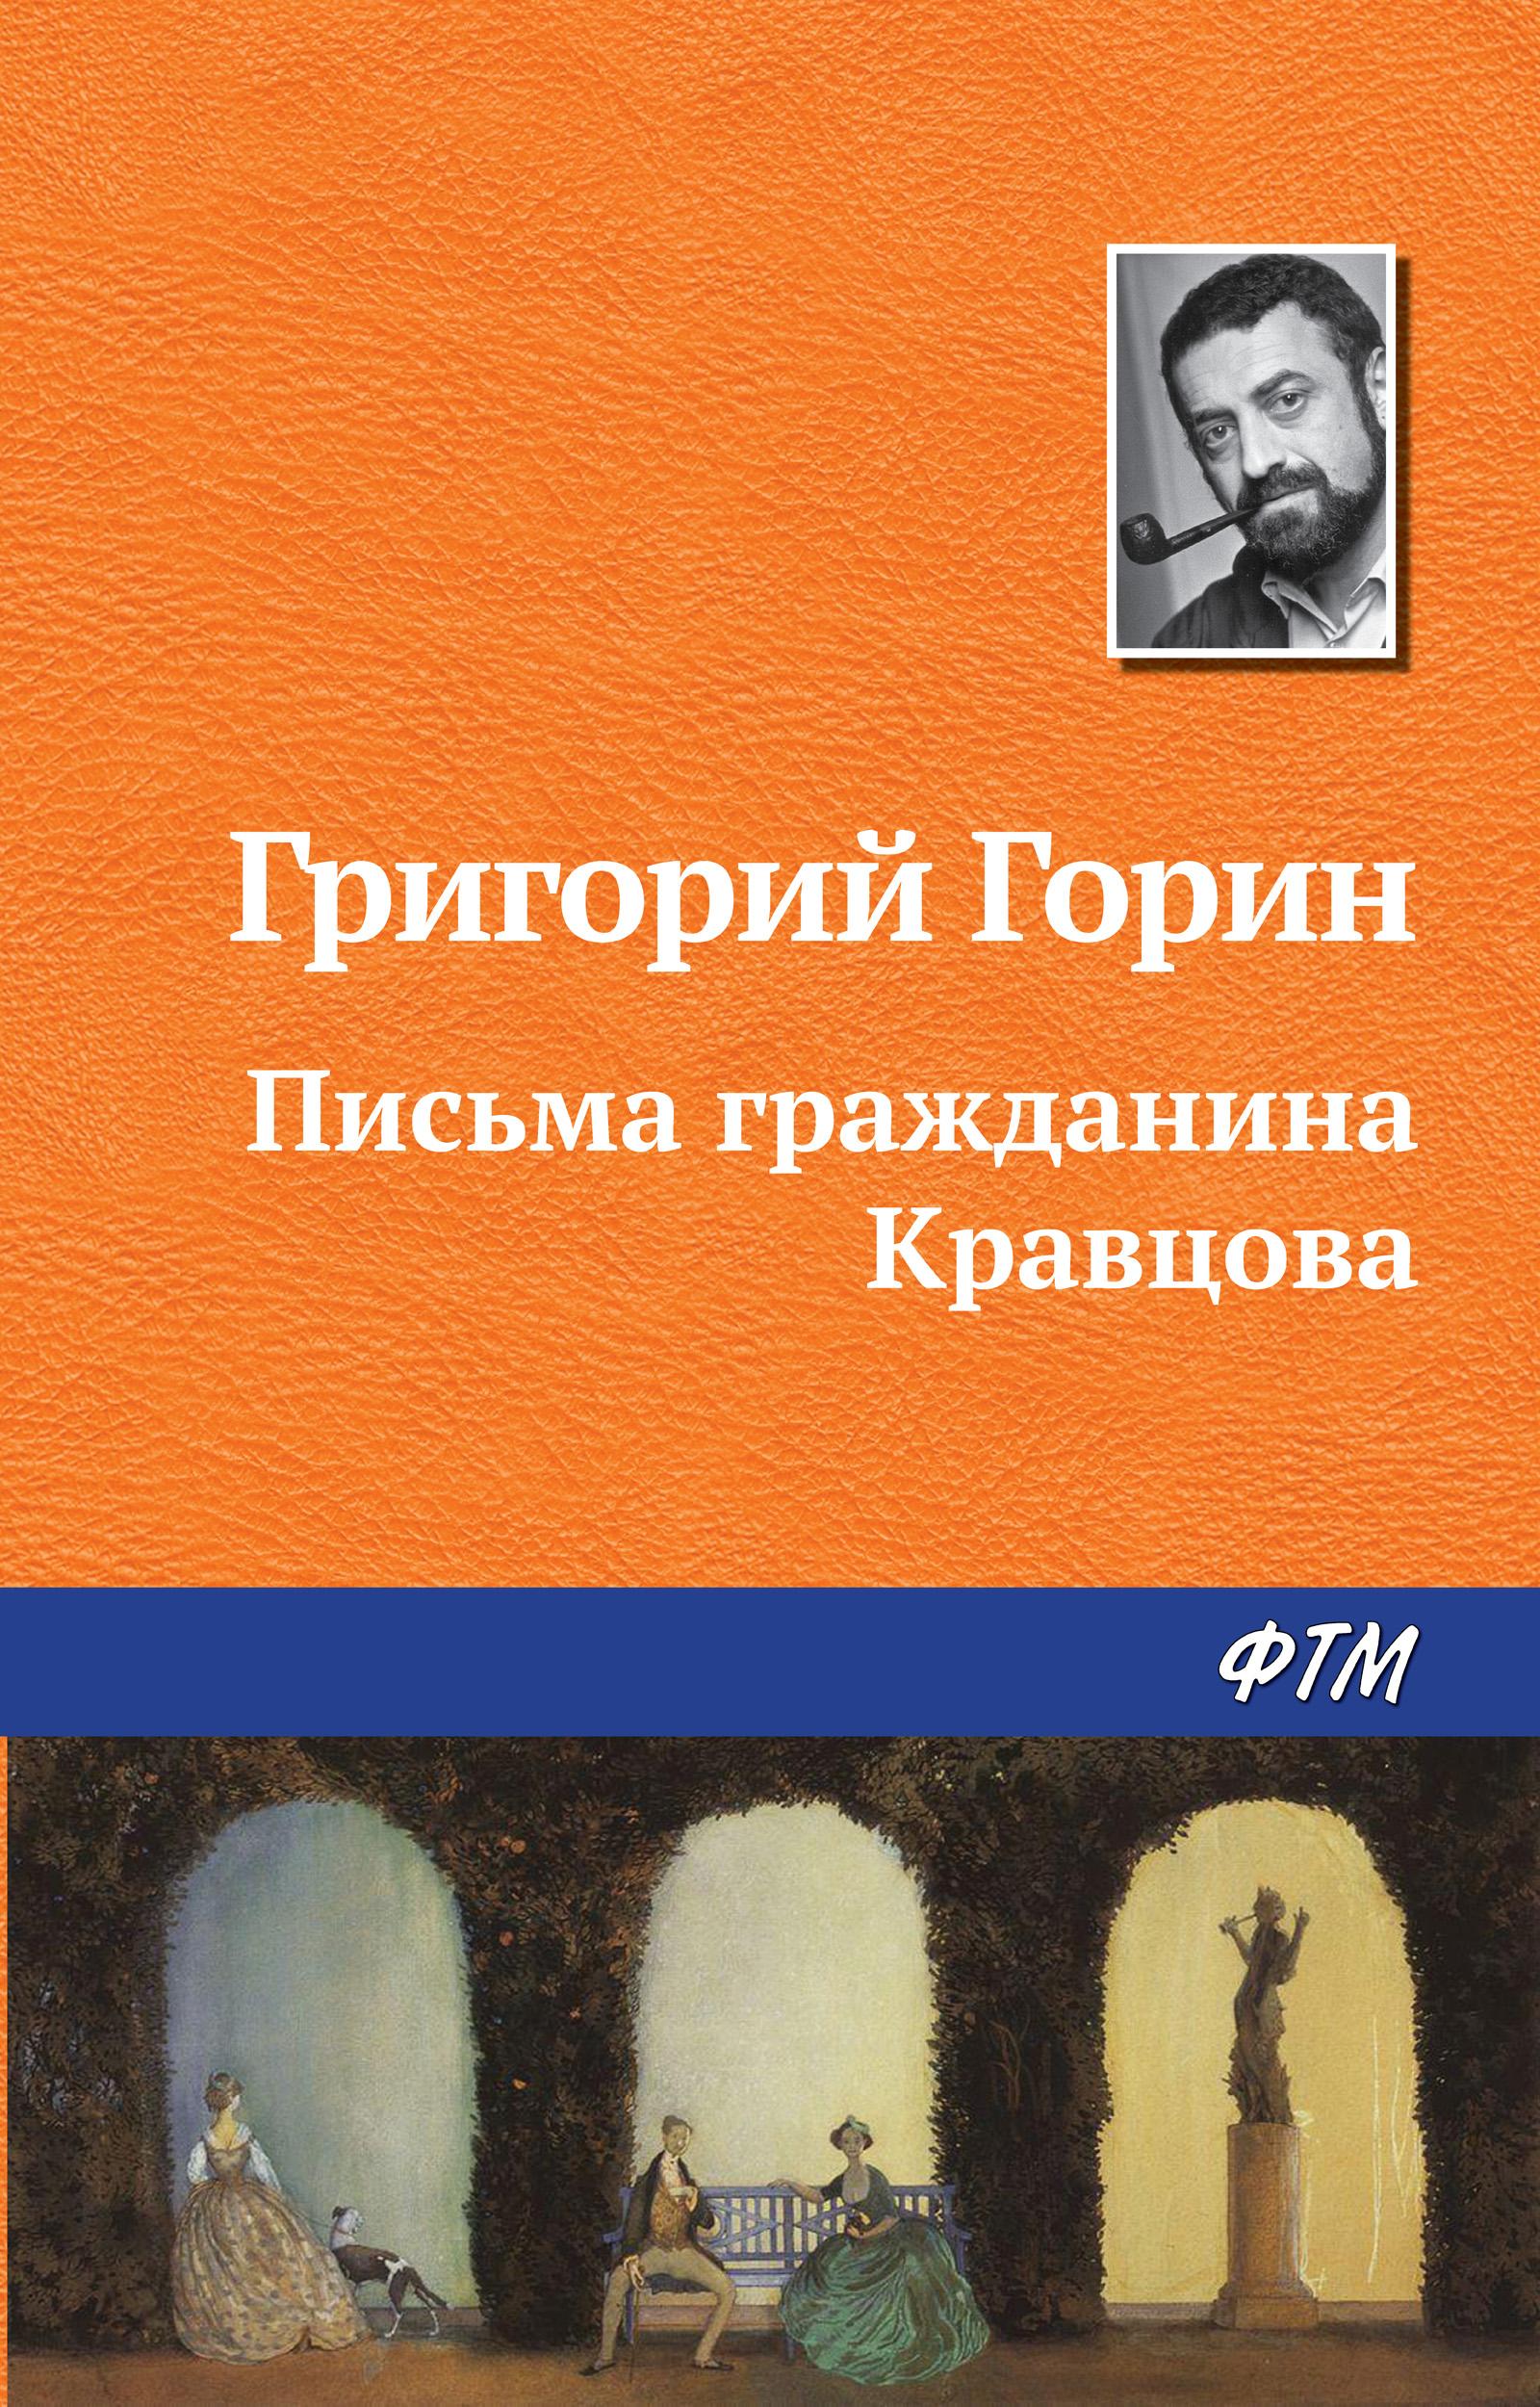 Письма гражданина Кравцова